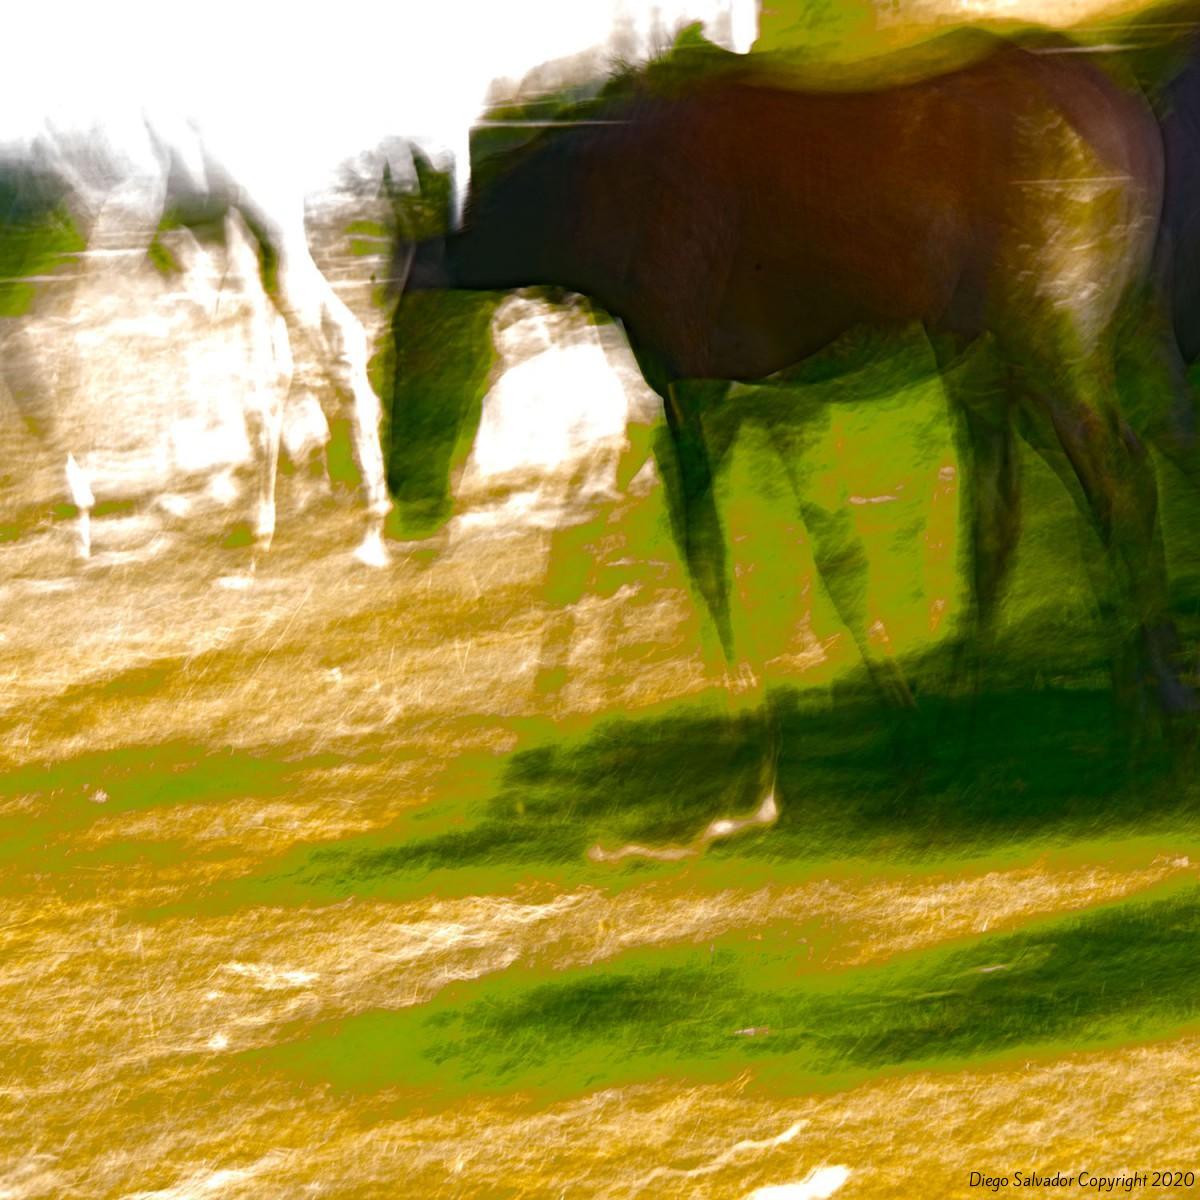 2014 - Eleganthorse5 - Diego Salvador